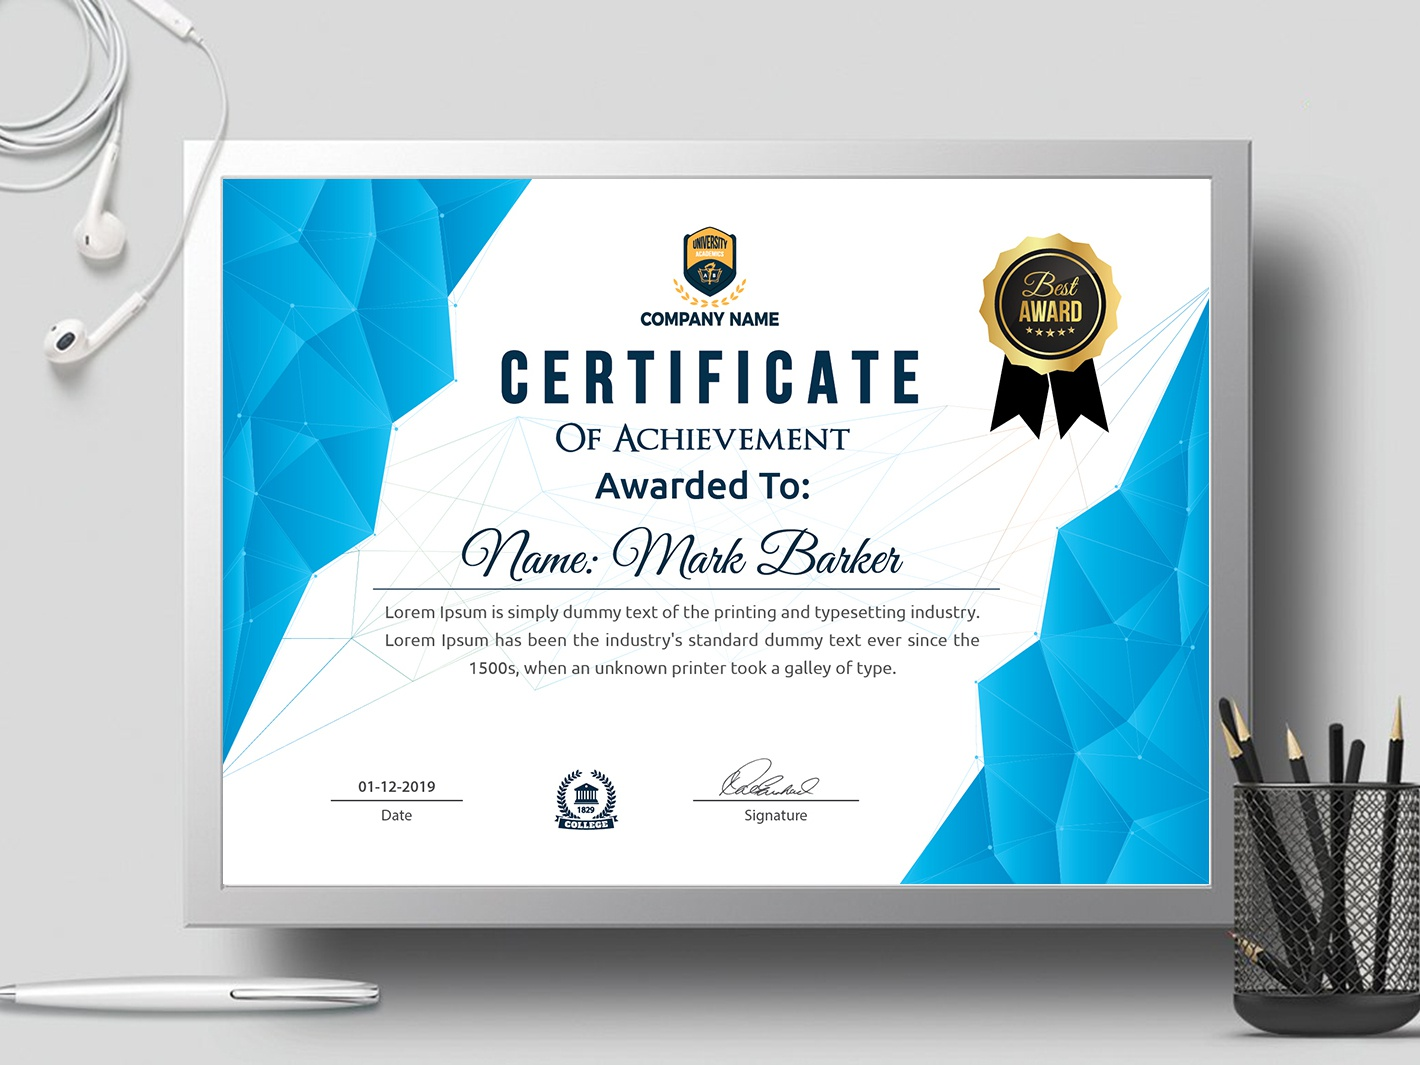 Certificate Template white certificate web certificate standard simple certificate professional certificate print certificate official modern certificate letterhead landscape certificate graphic creative certificate certificate green certificate design certificate business certificate black certificate blue certificate